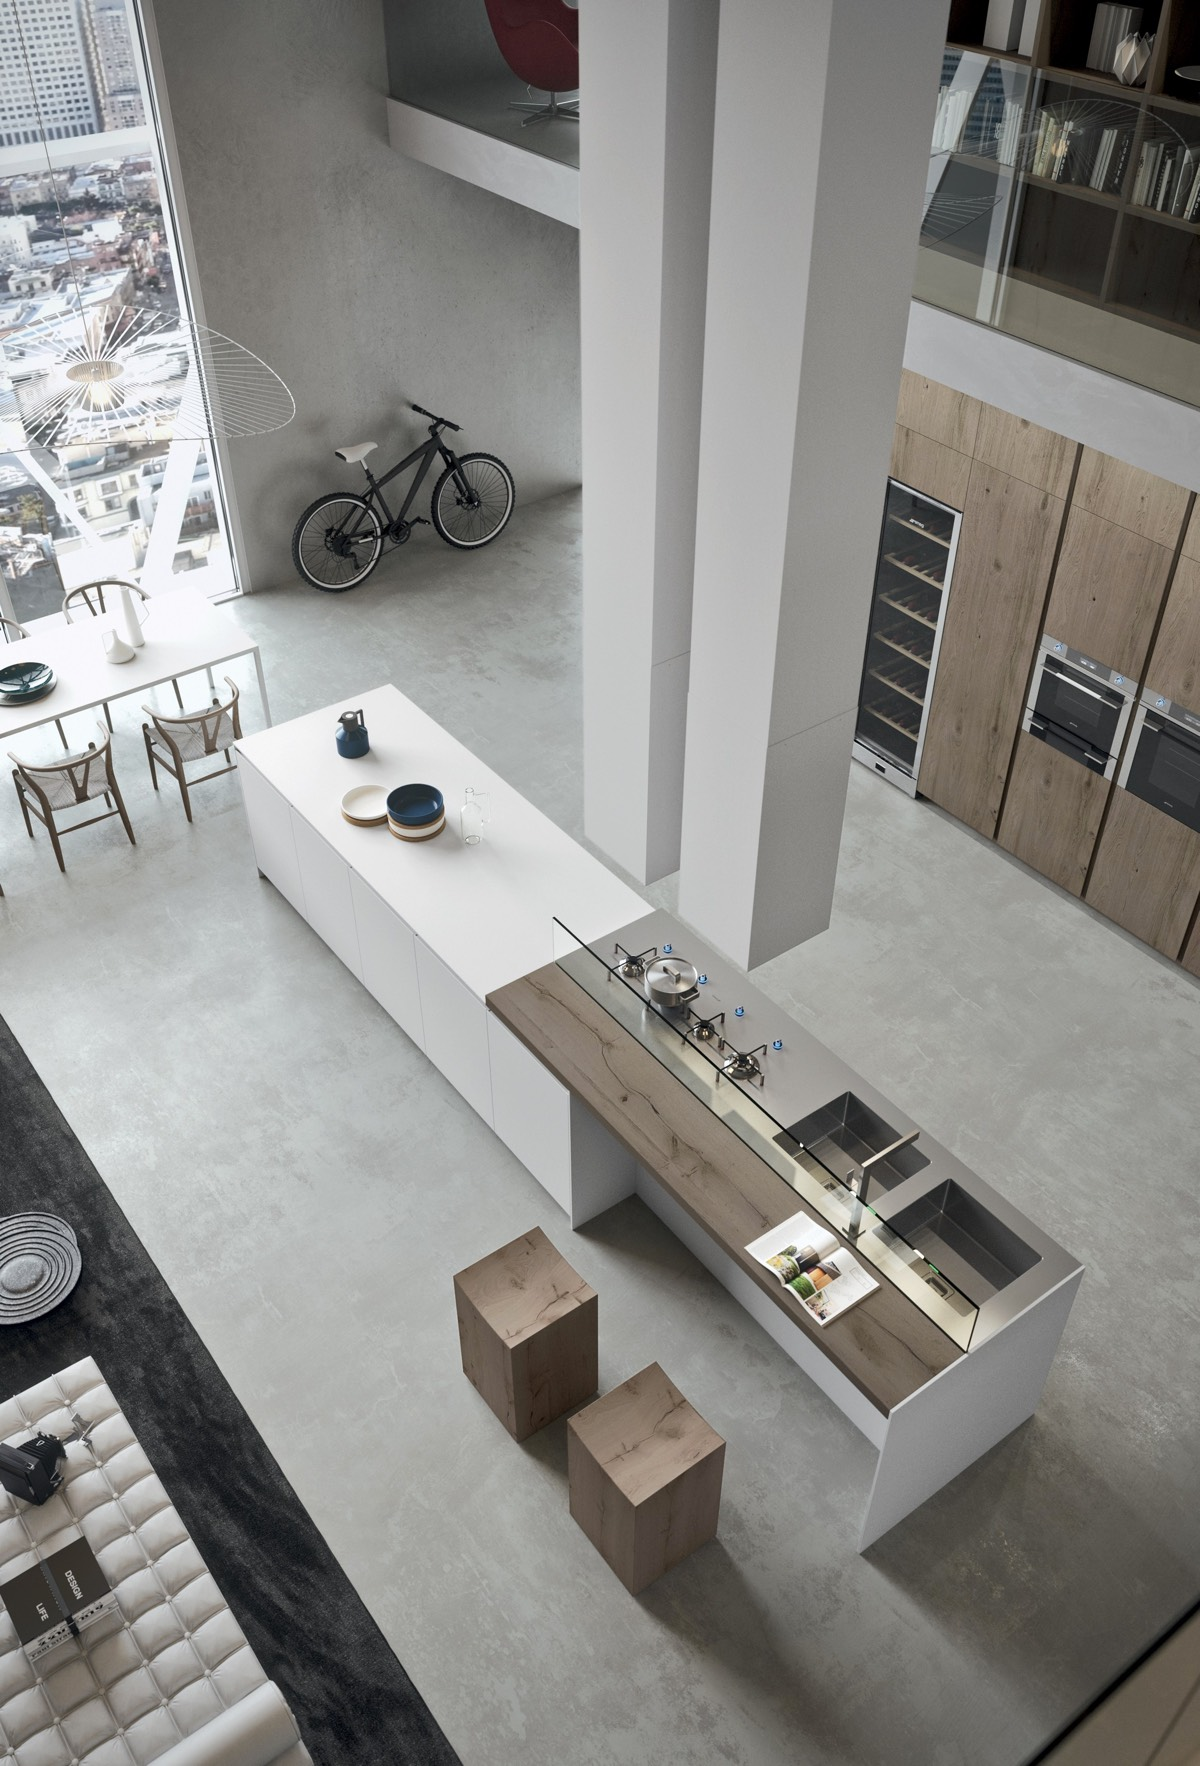 7 inspirational loft interiors. Black Bedroom Furniture Sets. Home Design Ideas